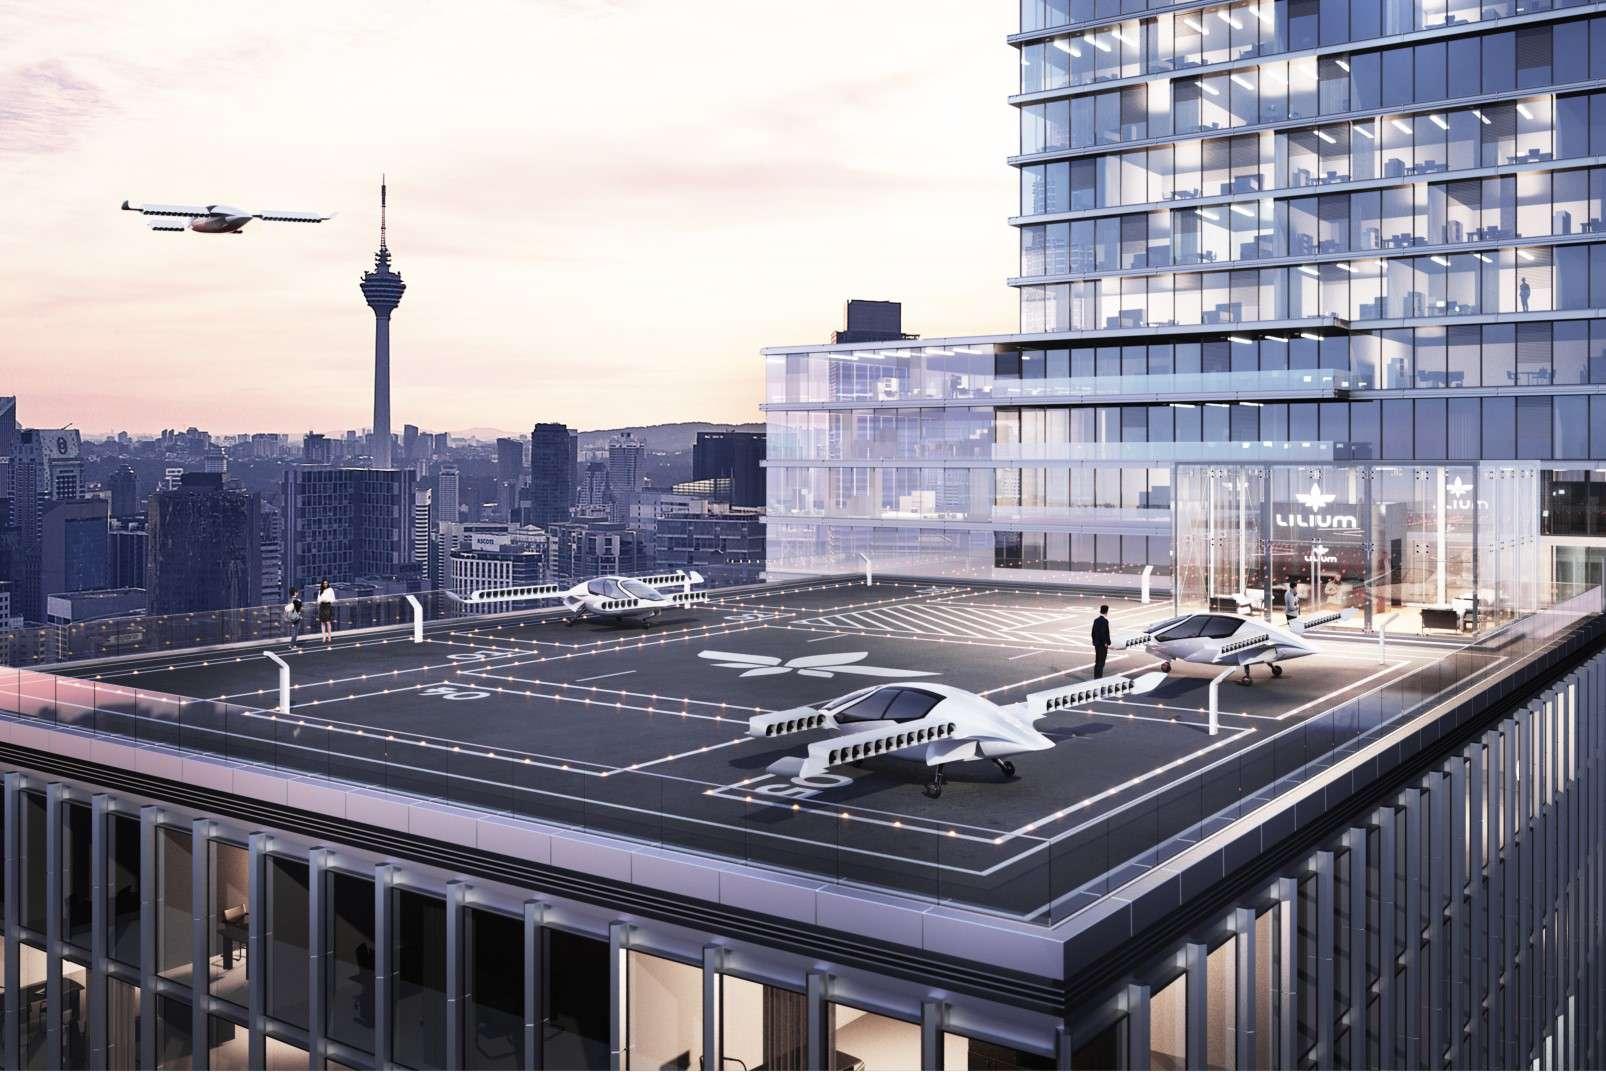 Lilium passenger-carrying drone landing pad rooftop